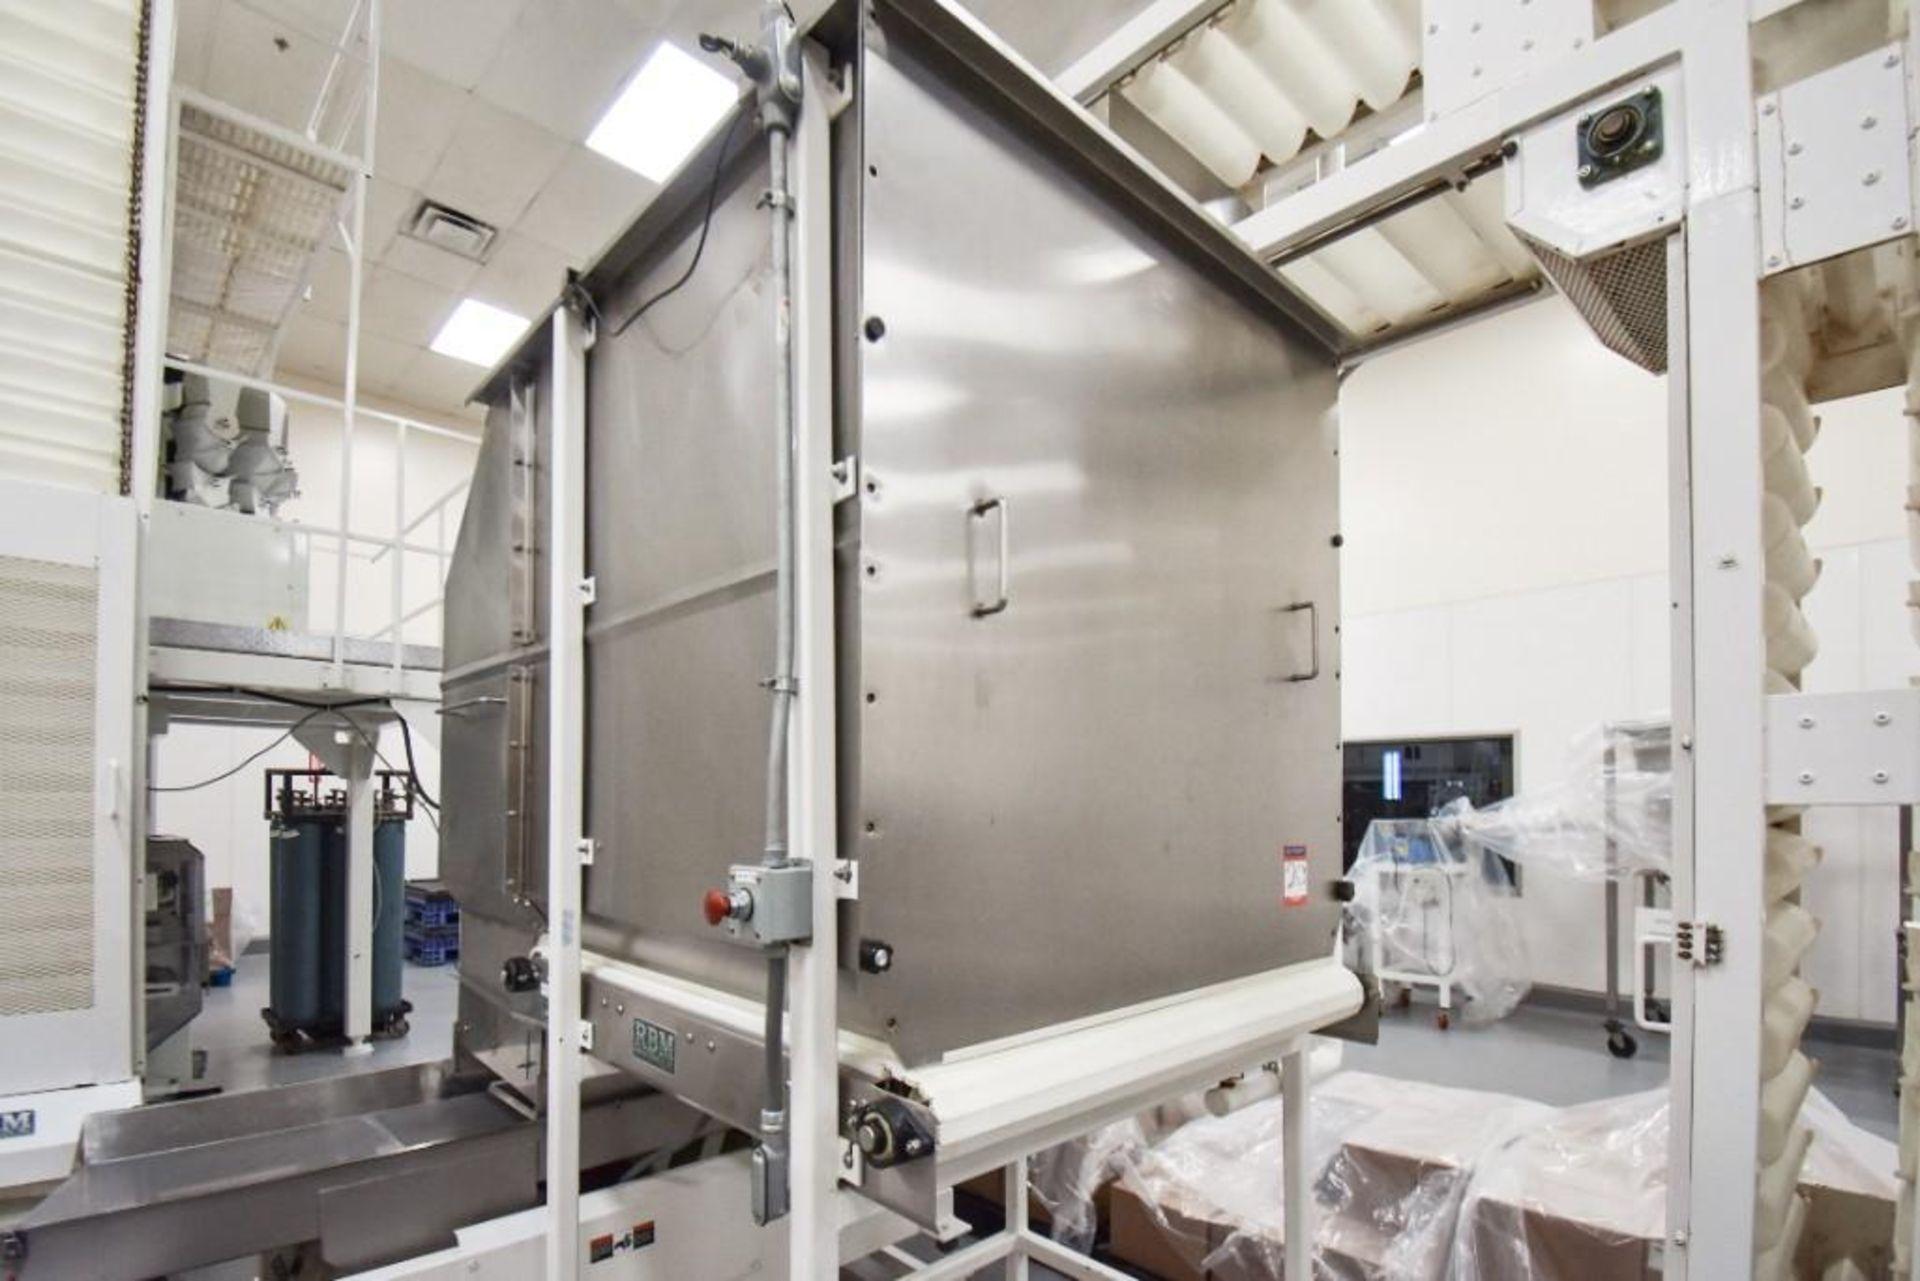 RBM Accumulation Hopper Conveyor and Vibratory Deck AC-1-4X4-6 - Image 2 of 11